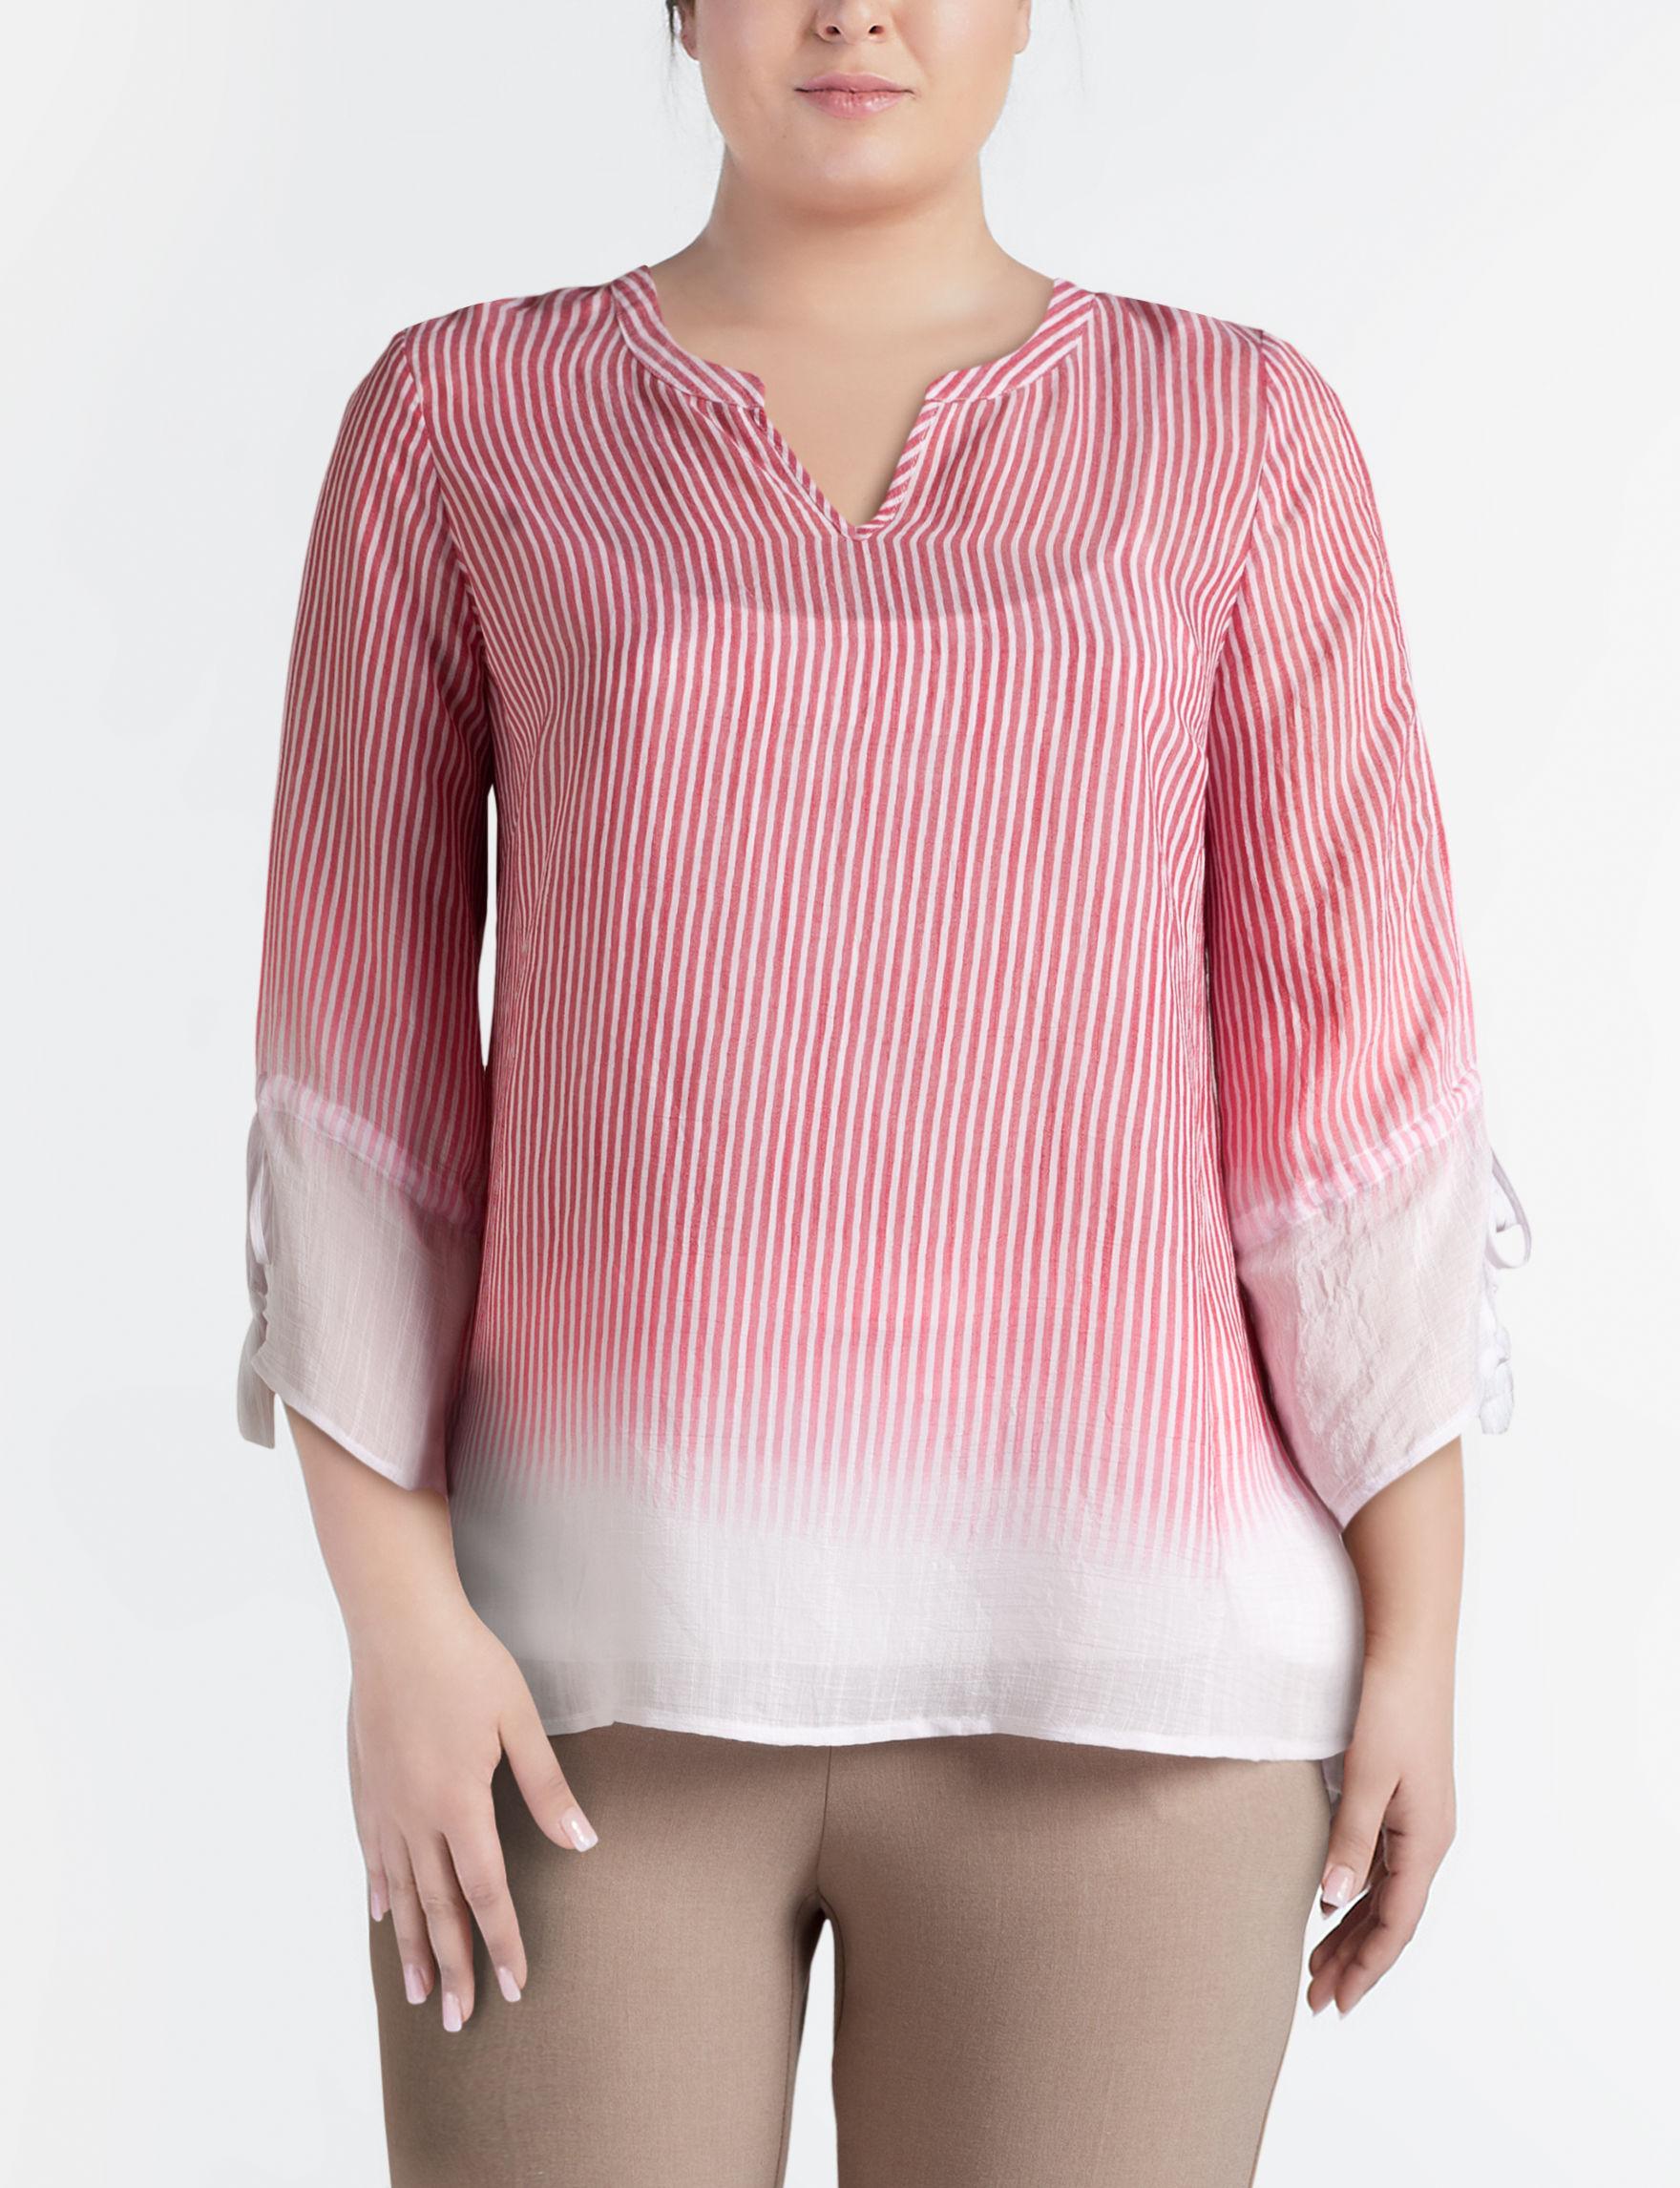 Zac & Rachel Red / White Shirts & Blouses